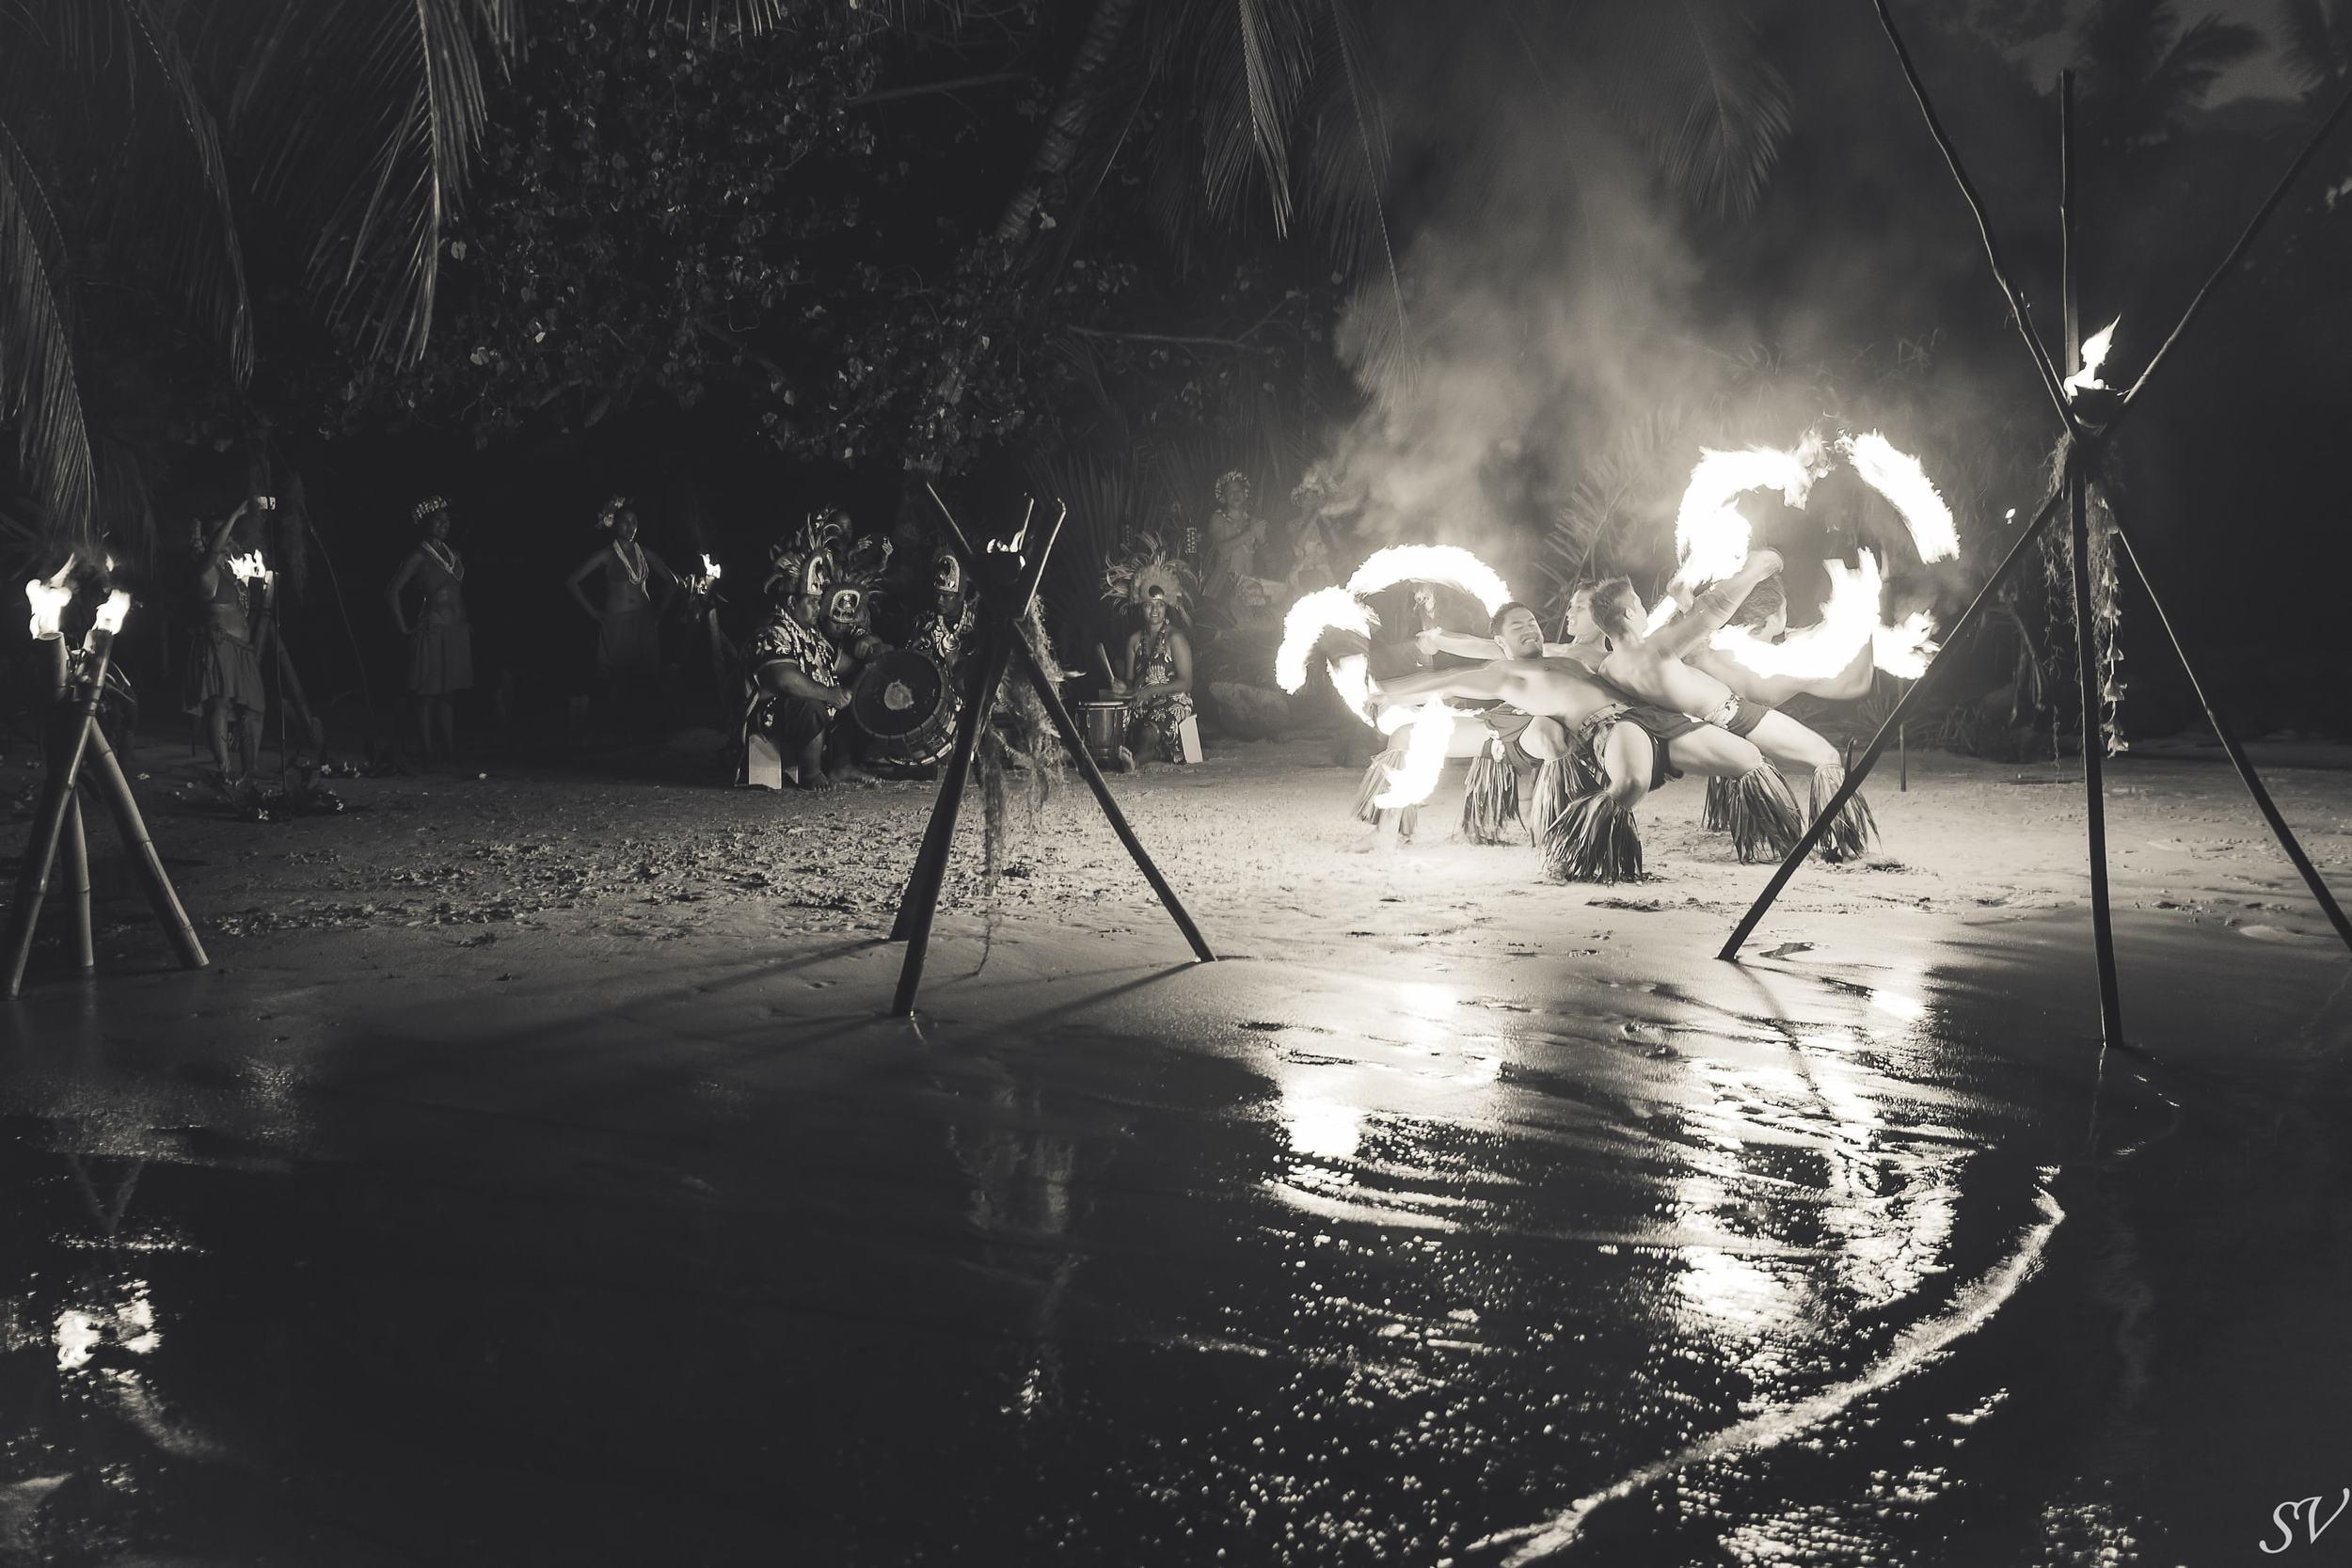 Fire dancing during a destination wedding in Moorea